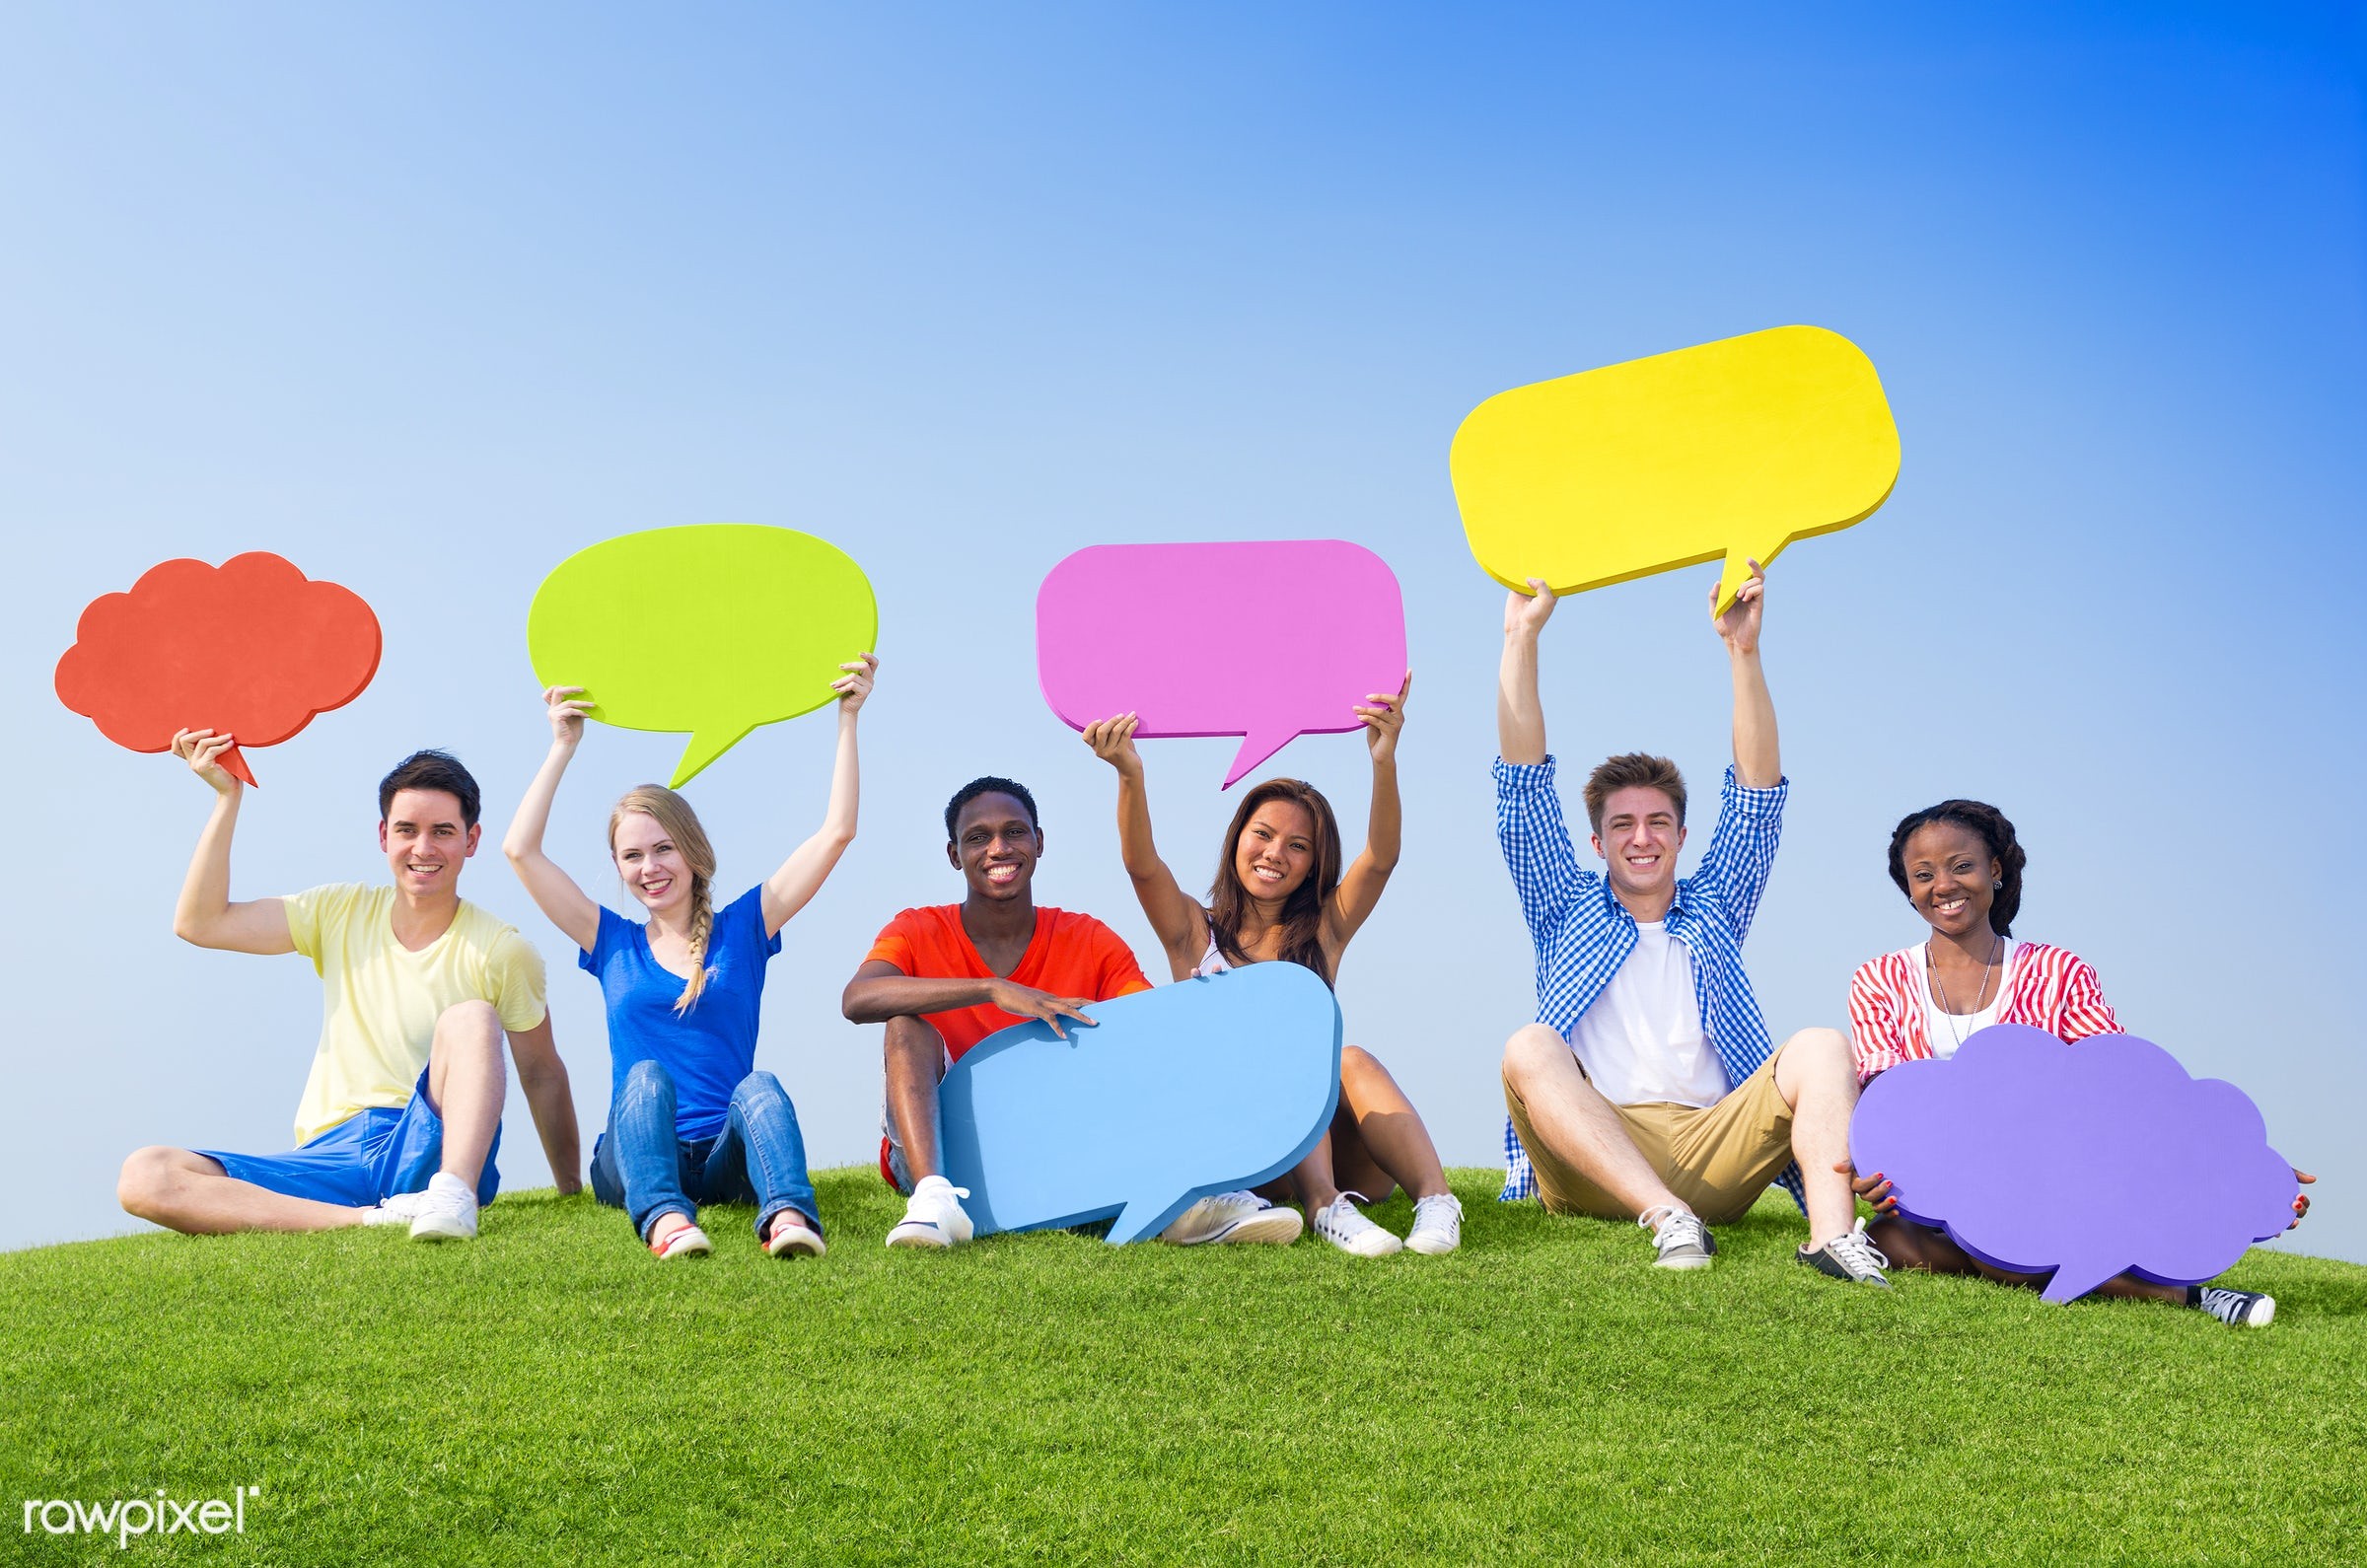 holding, arm raised, blue sky, bubble, chat box, chat bubble, cheerful, cloud, communication, community, confident, connect...